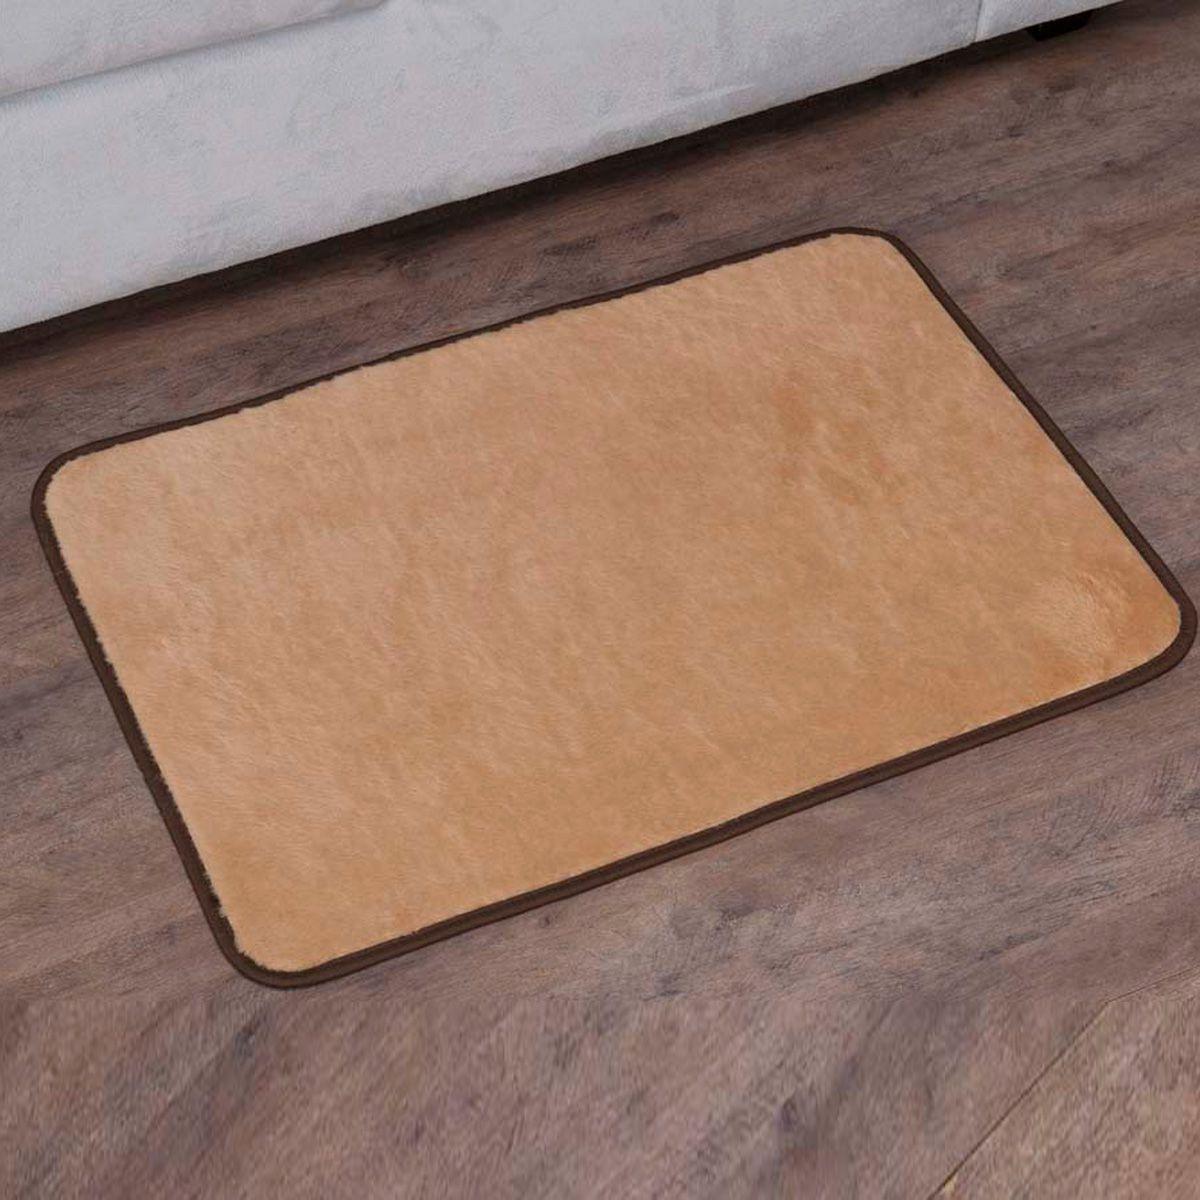 Tapete Retangular Premium p/ Sala Bege Liso 0,68m x 0,48m